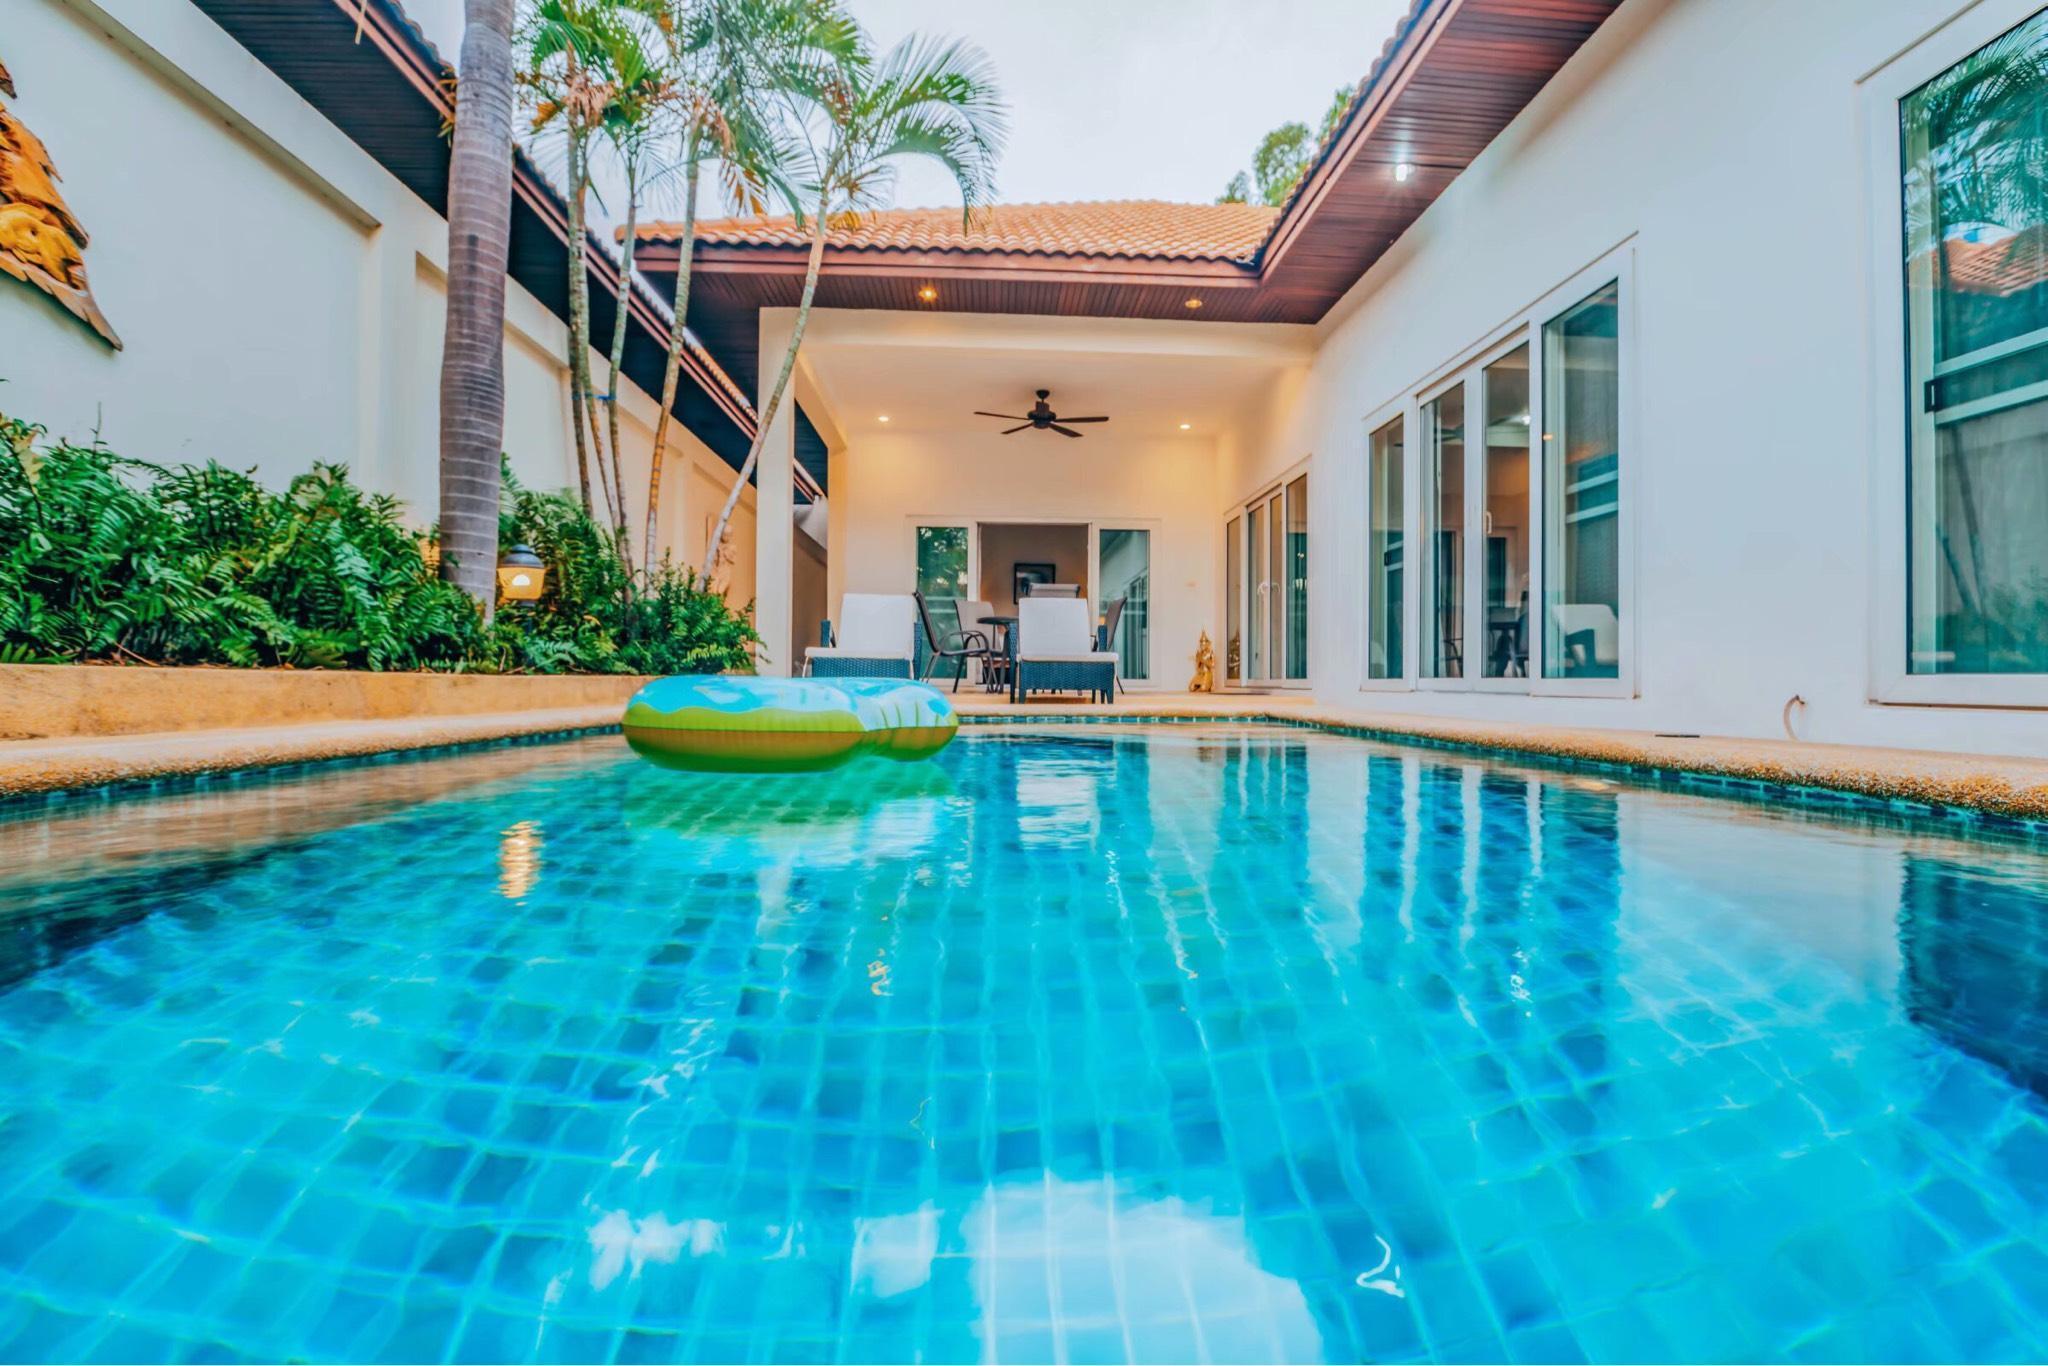 Pattaya 3 Bedroom Pool Villa  Walking street-52 วิลลา 3 ห้องนอน 2 ห้องน้ำส่วนตัว ขนาด 260 ตร.ม. – เขาพระตำหนัก